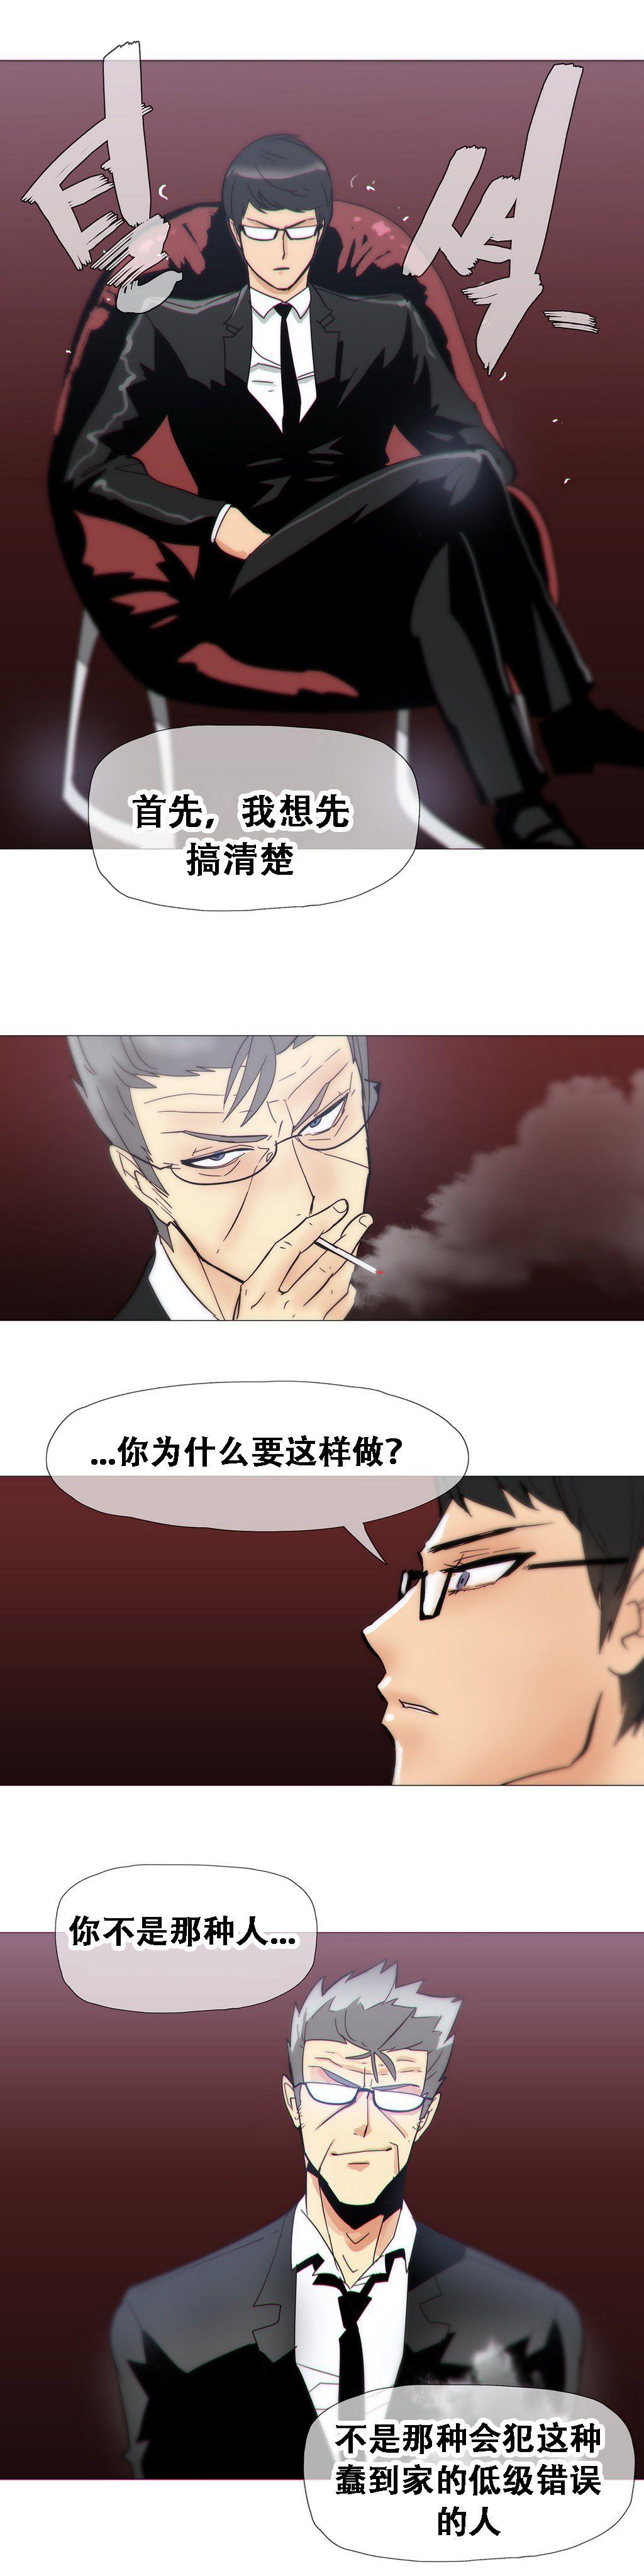 HouseHold Affairs 【卞赤鲤个人汉化】1~21话(持续更新中) 330